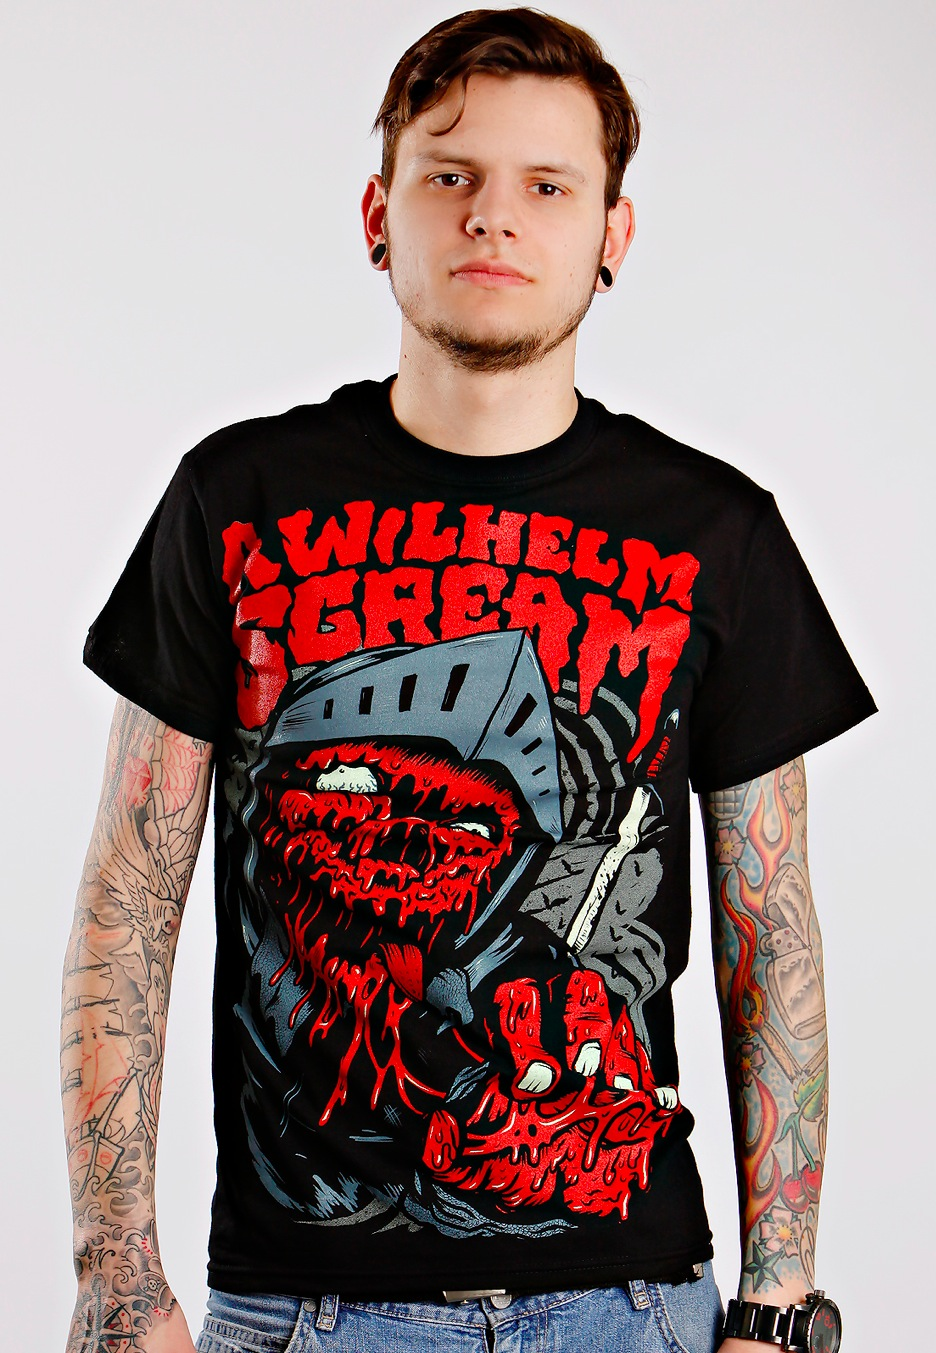 A Wilhelm Scream - Knight - T-Shirt - Official Merchandise Shop - Impericon.com Worldwide